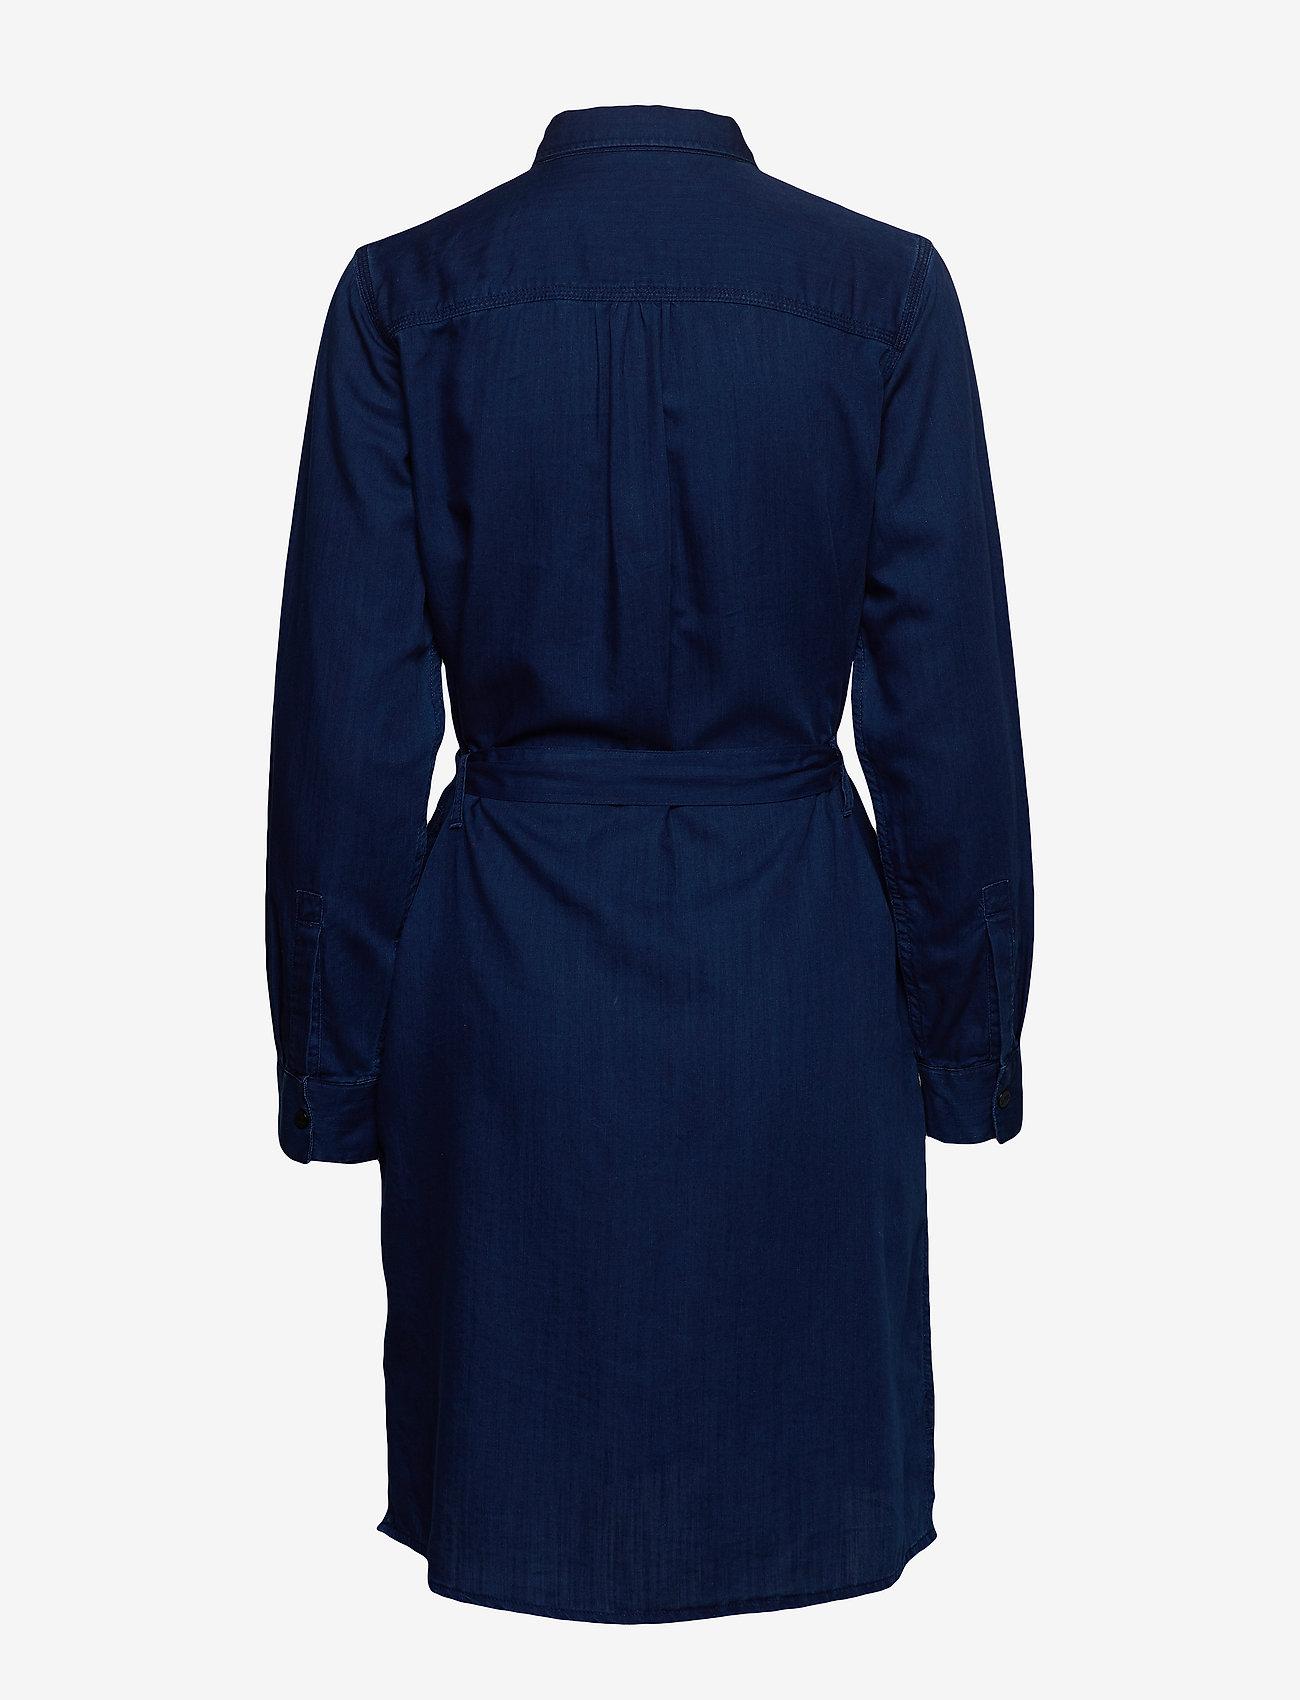 Shirt Dress (Oil Blue) - Lee Jeans fTf7Ix